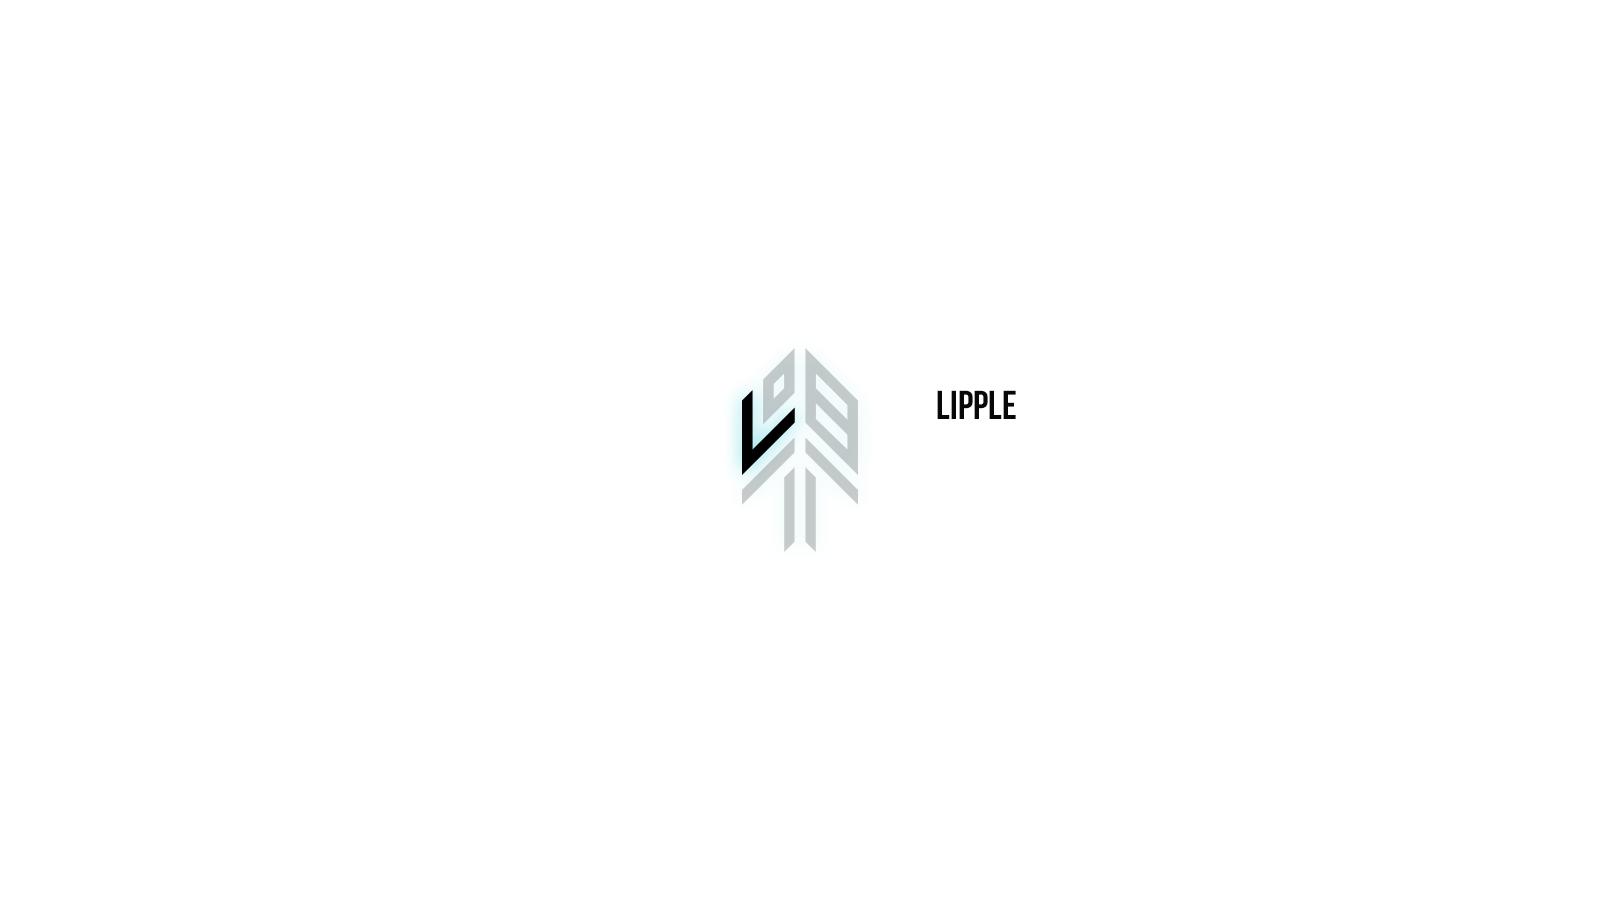 lipple.jpg